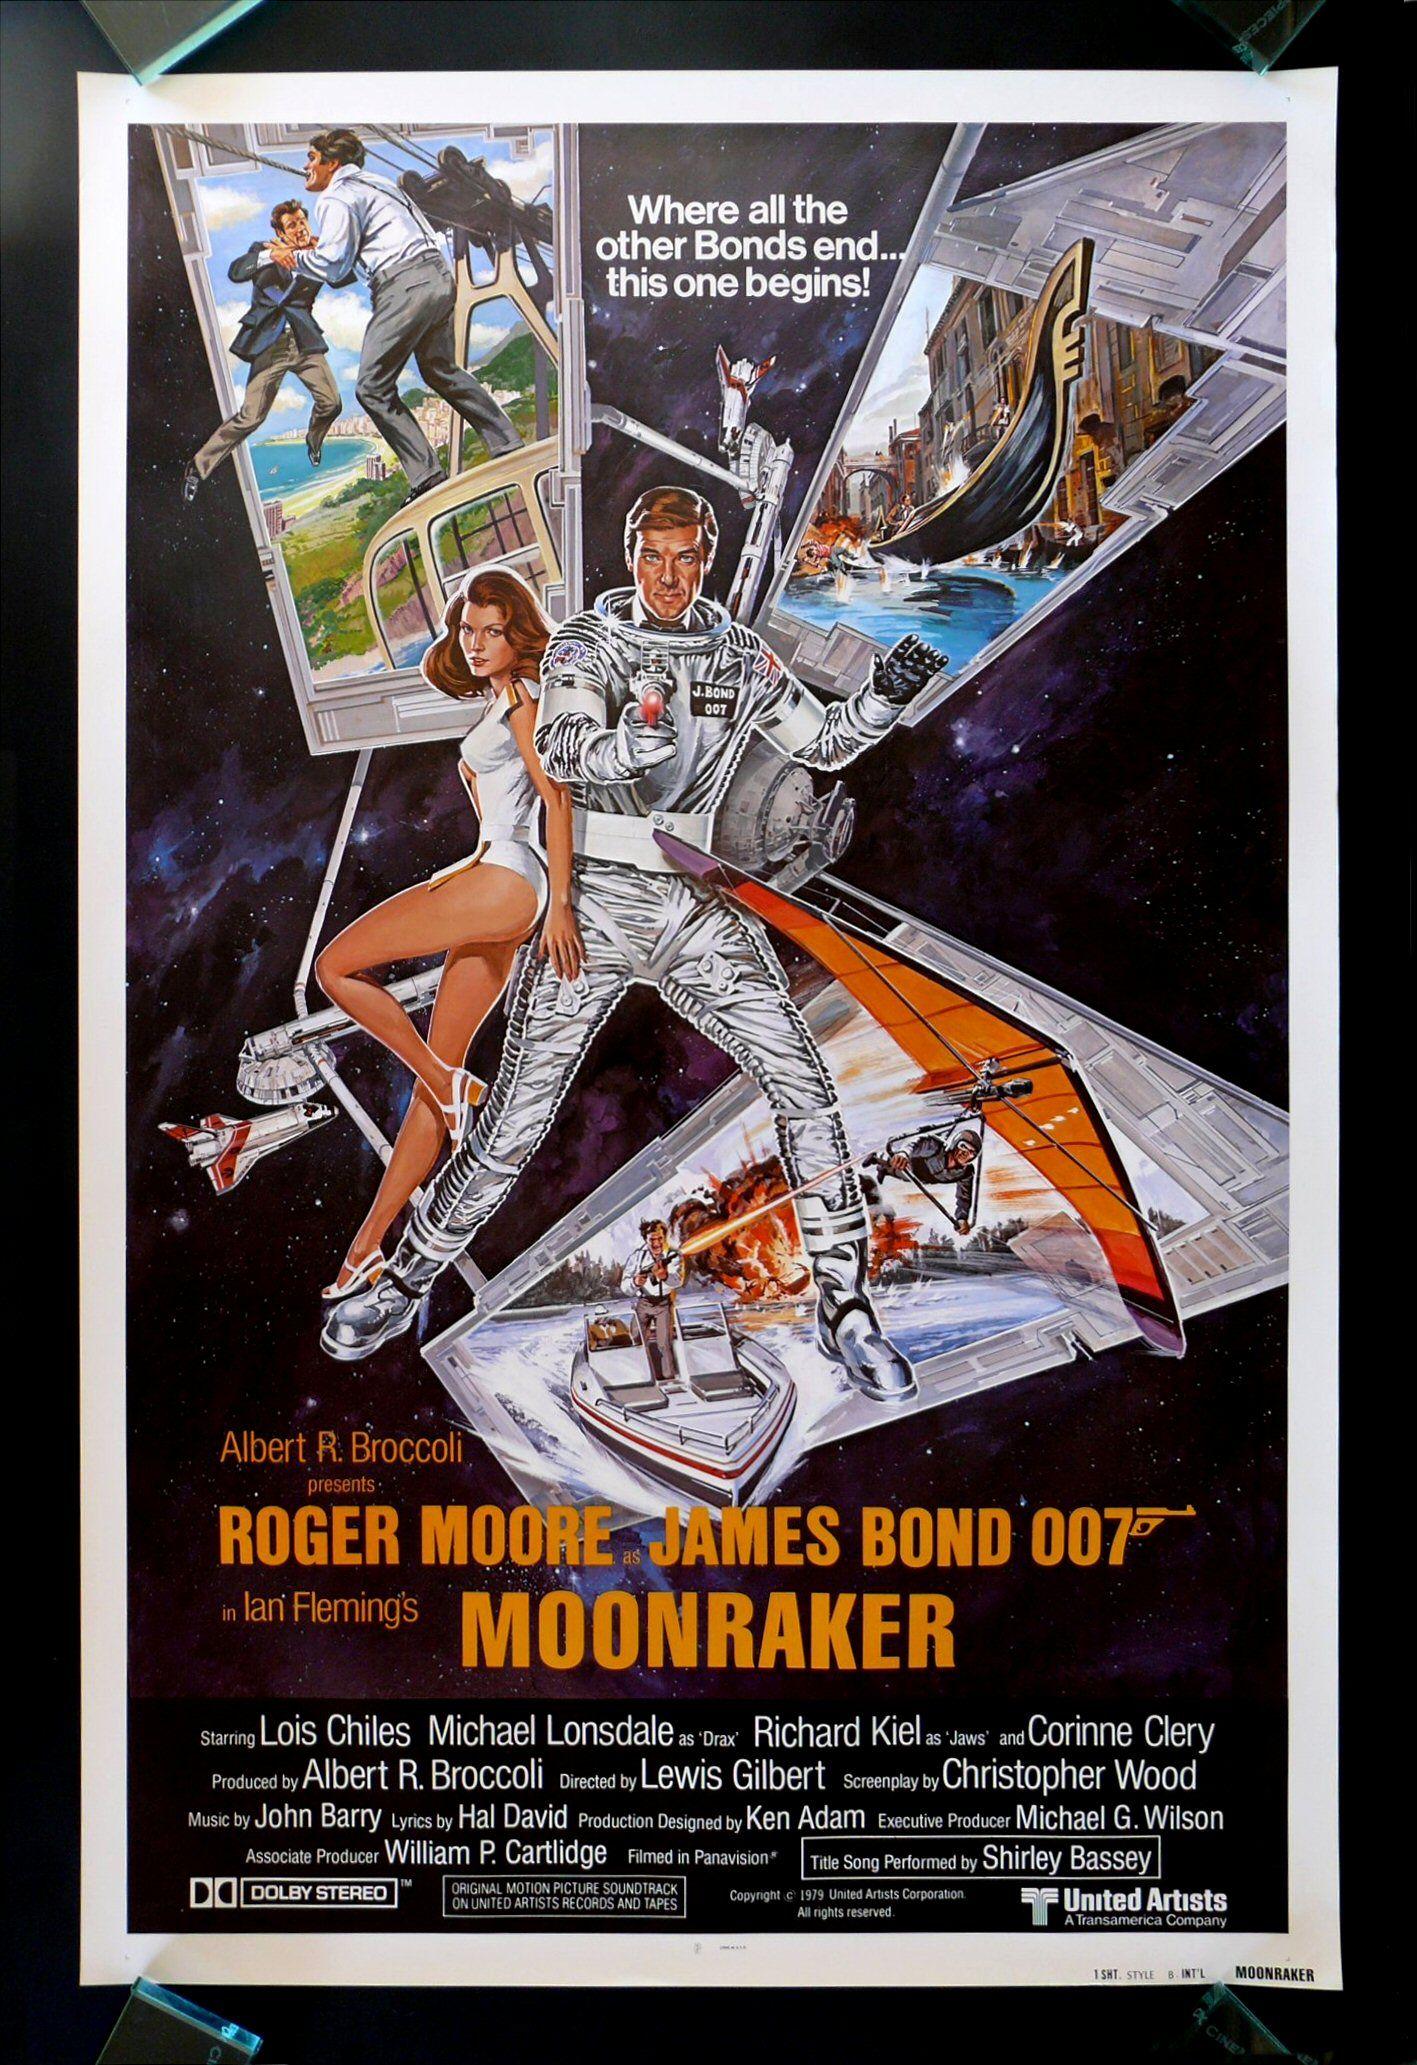 007 11 1979 Moonraker Bond Roger Moore 4th Bondgirls Lois